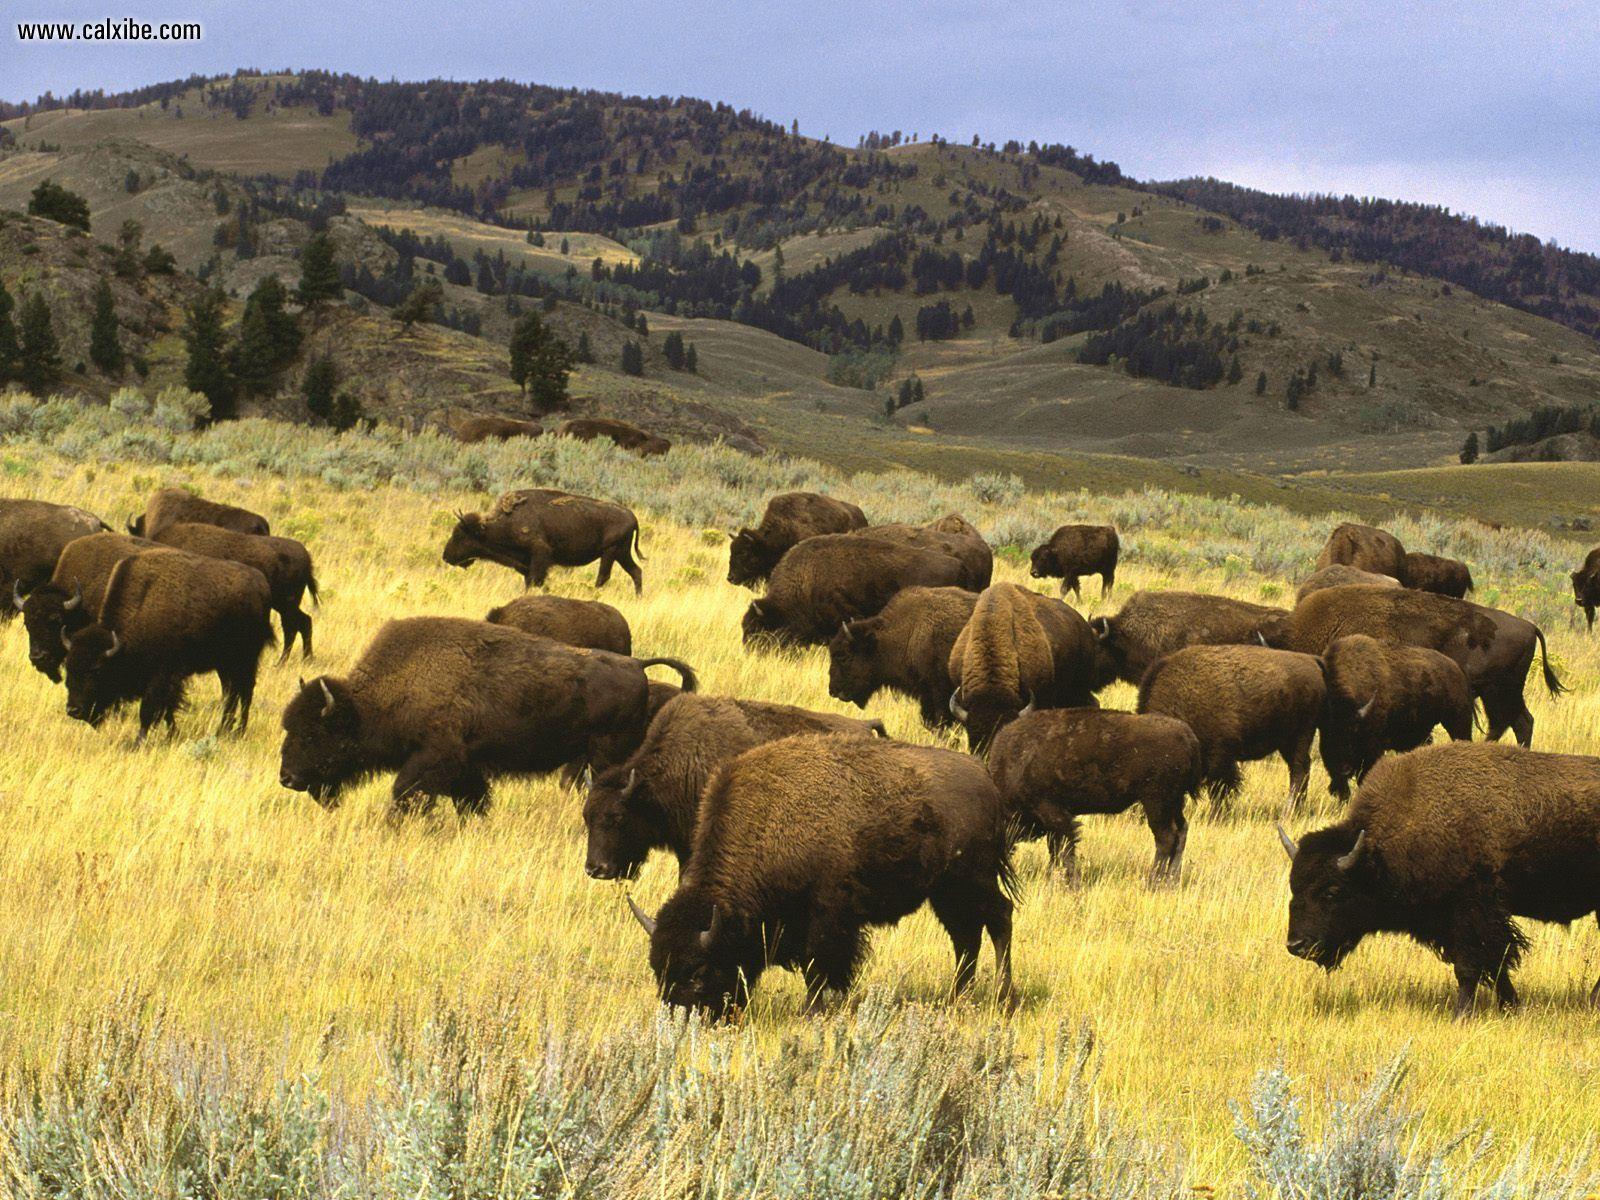 Yellowstone National Park A Hotspot Amongst The Tourists 1600x1200